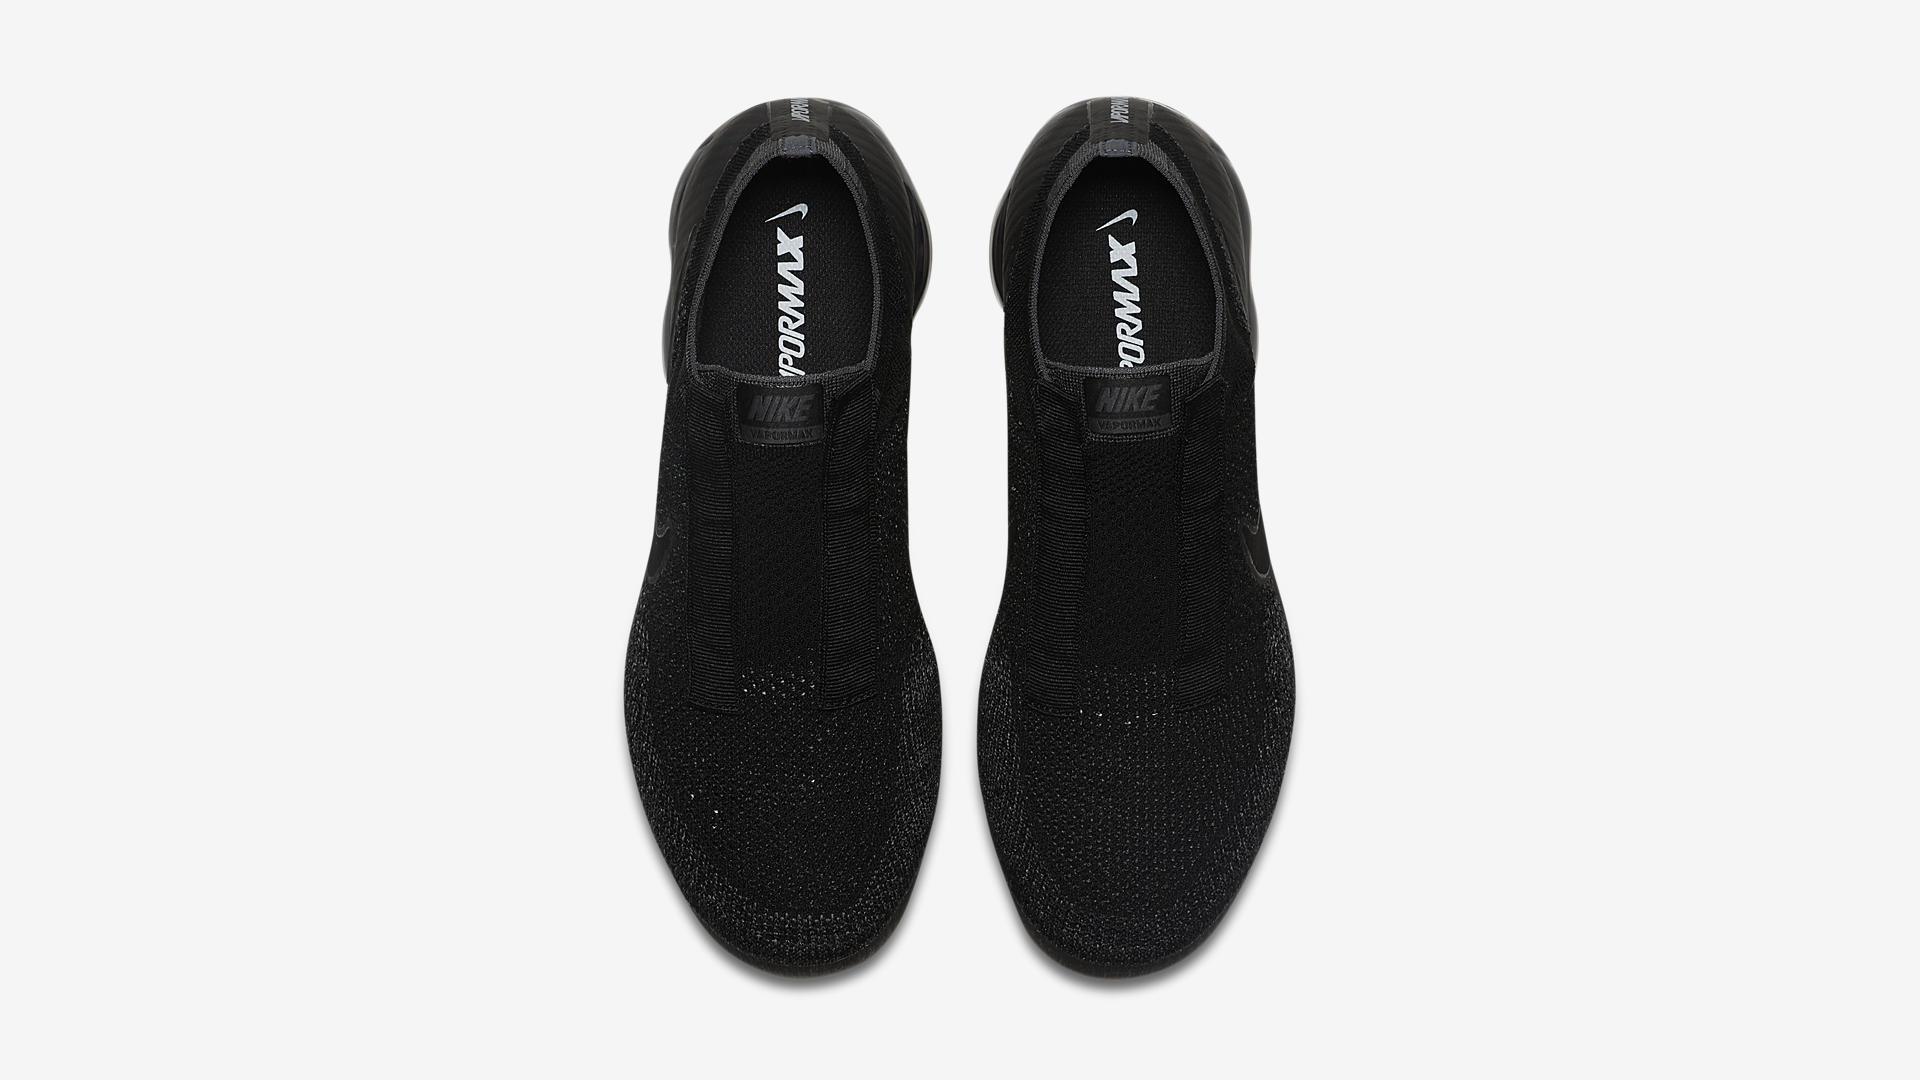 AQ0581 001 Nike Air VaporMax Laceless Night 3